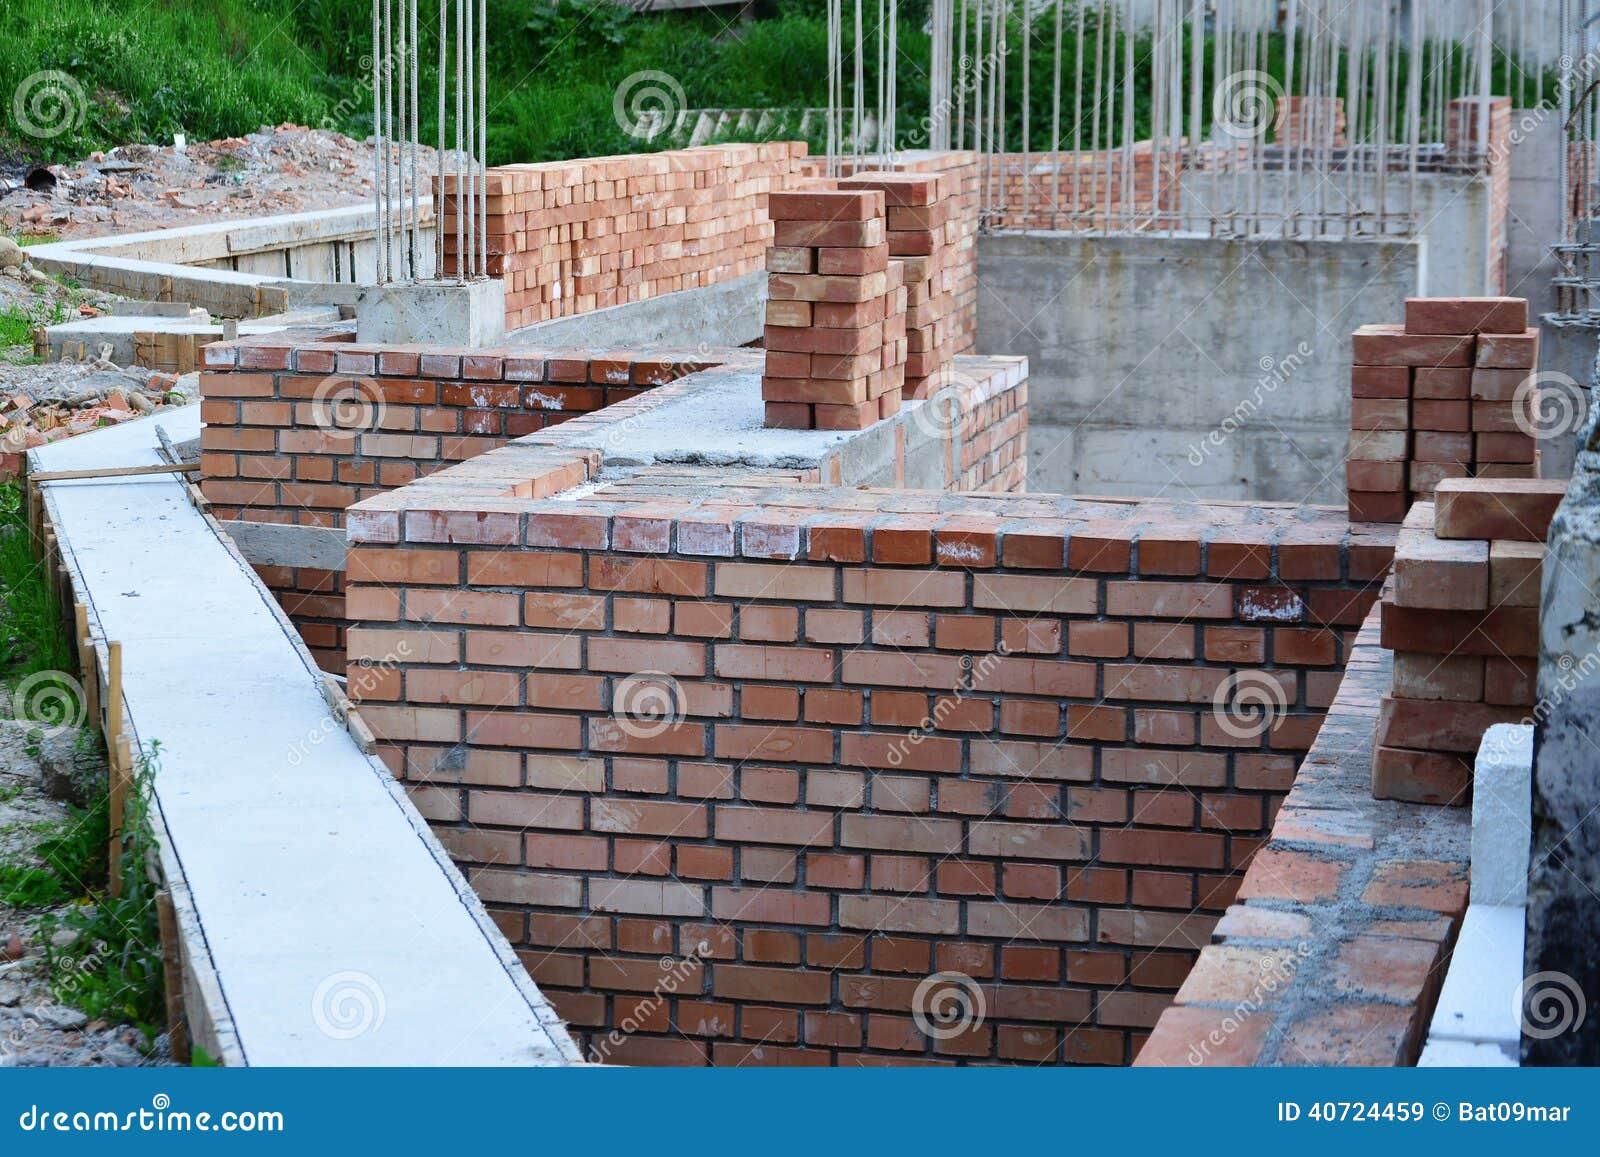 House Building Construction Area Details Stock Photo